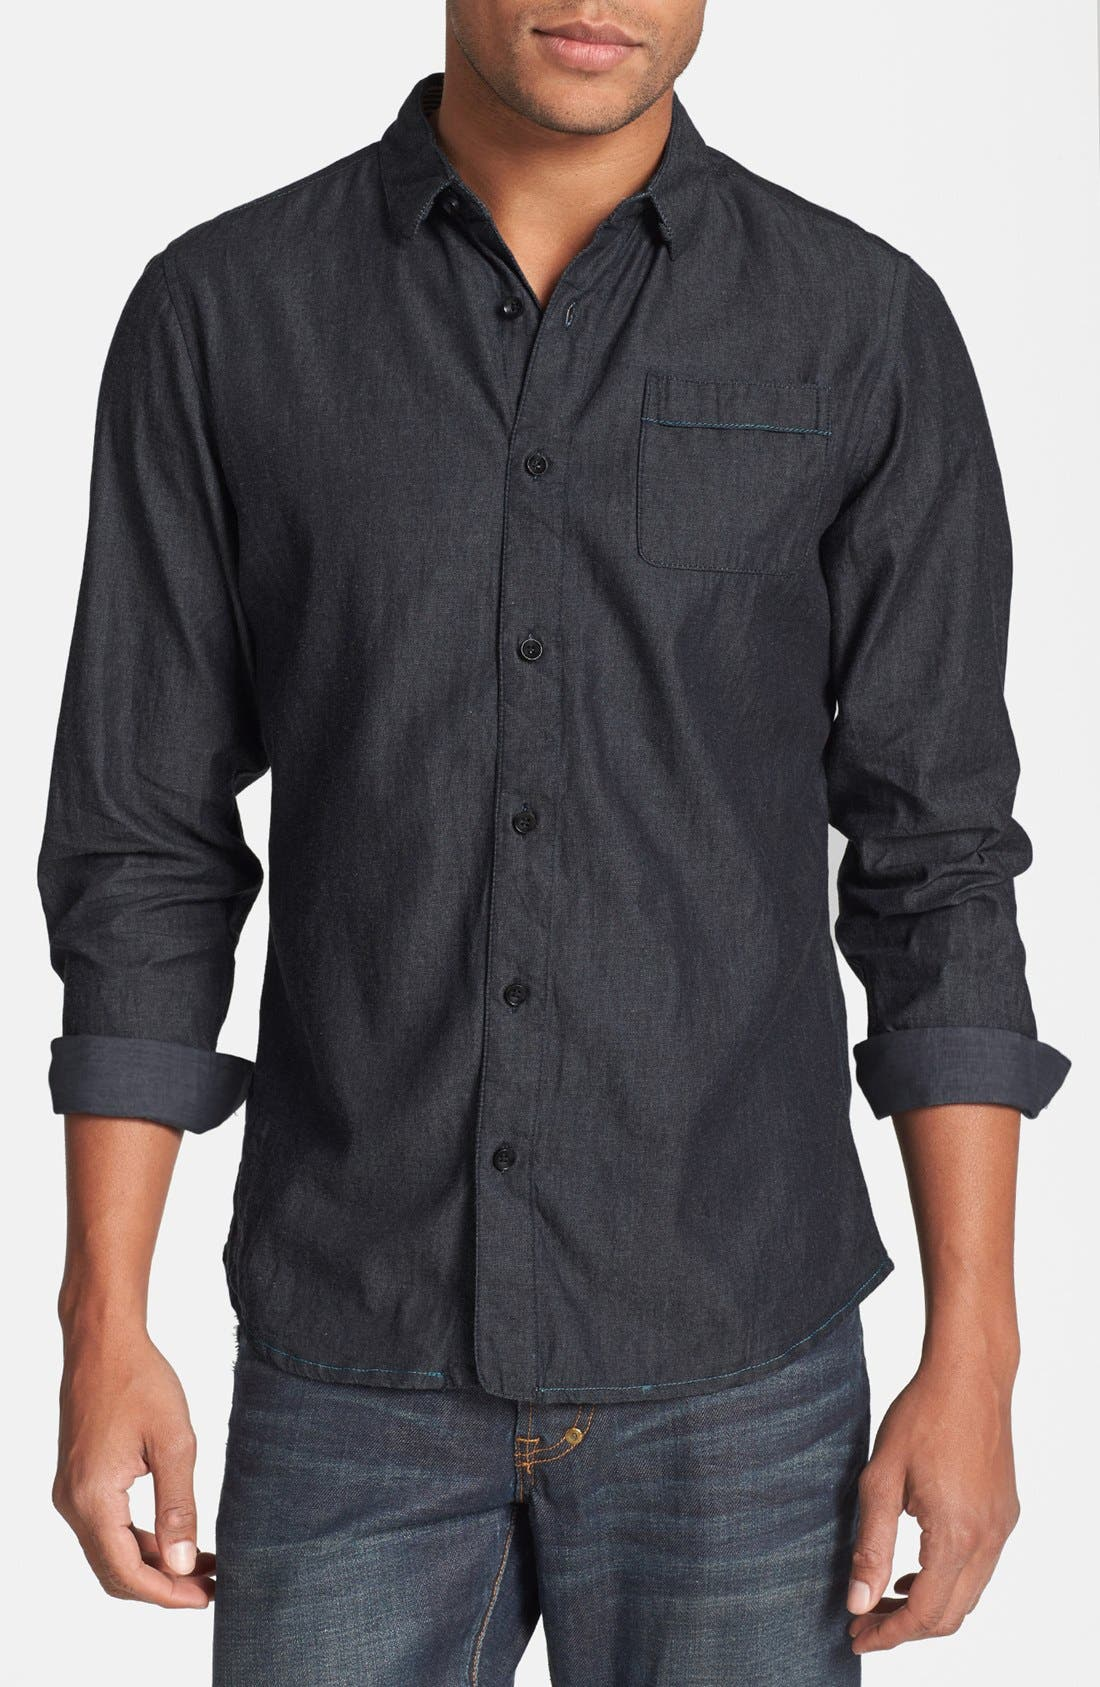 Alternate Image 1 Selected - Descendant of Thieves Chambray Denim Shirt